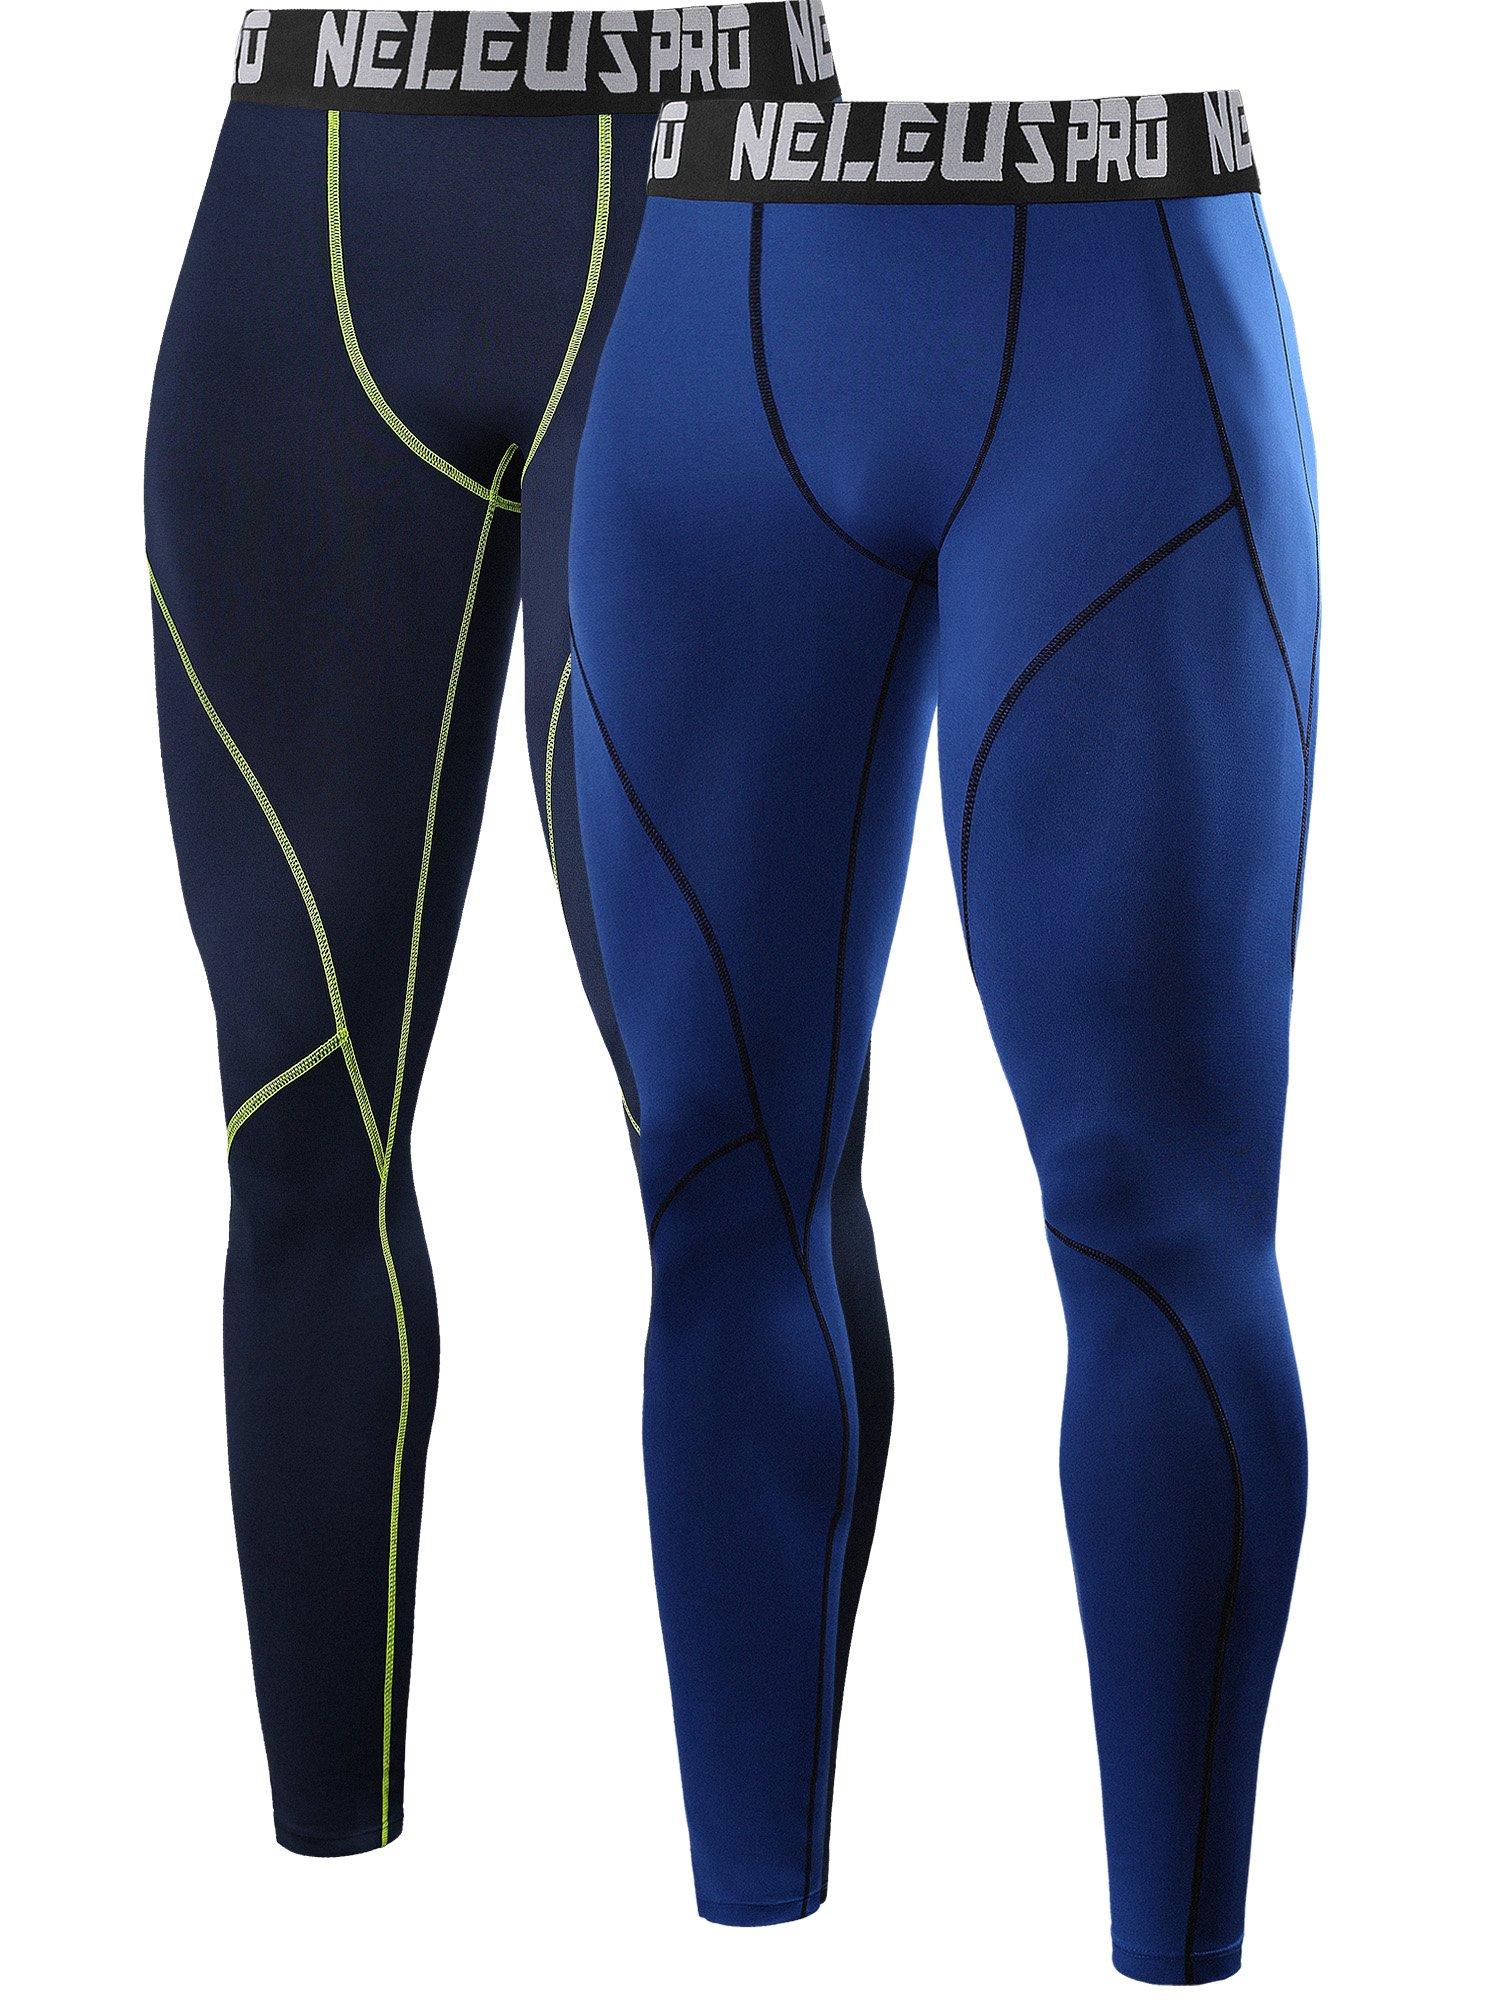 Neleus Men's 2 Pack Compression Pants Workout Running Tights Leggings,6013,Blue,Navy Blue,US S,EU M